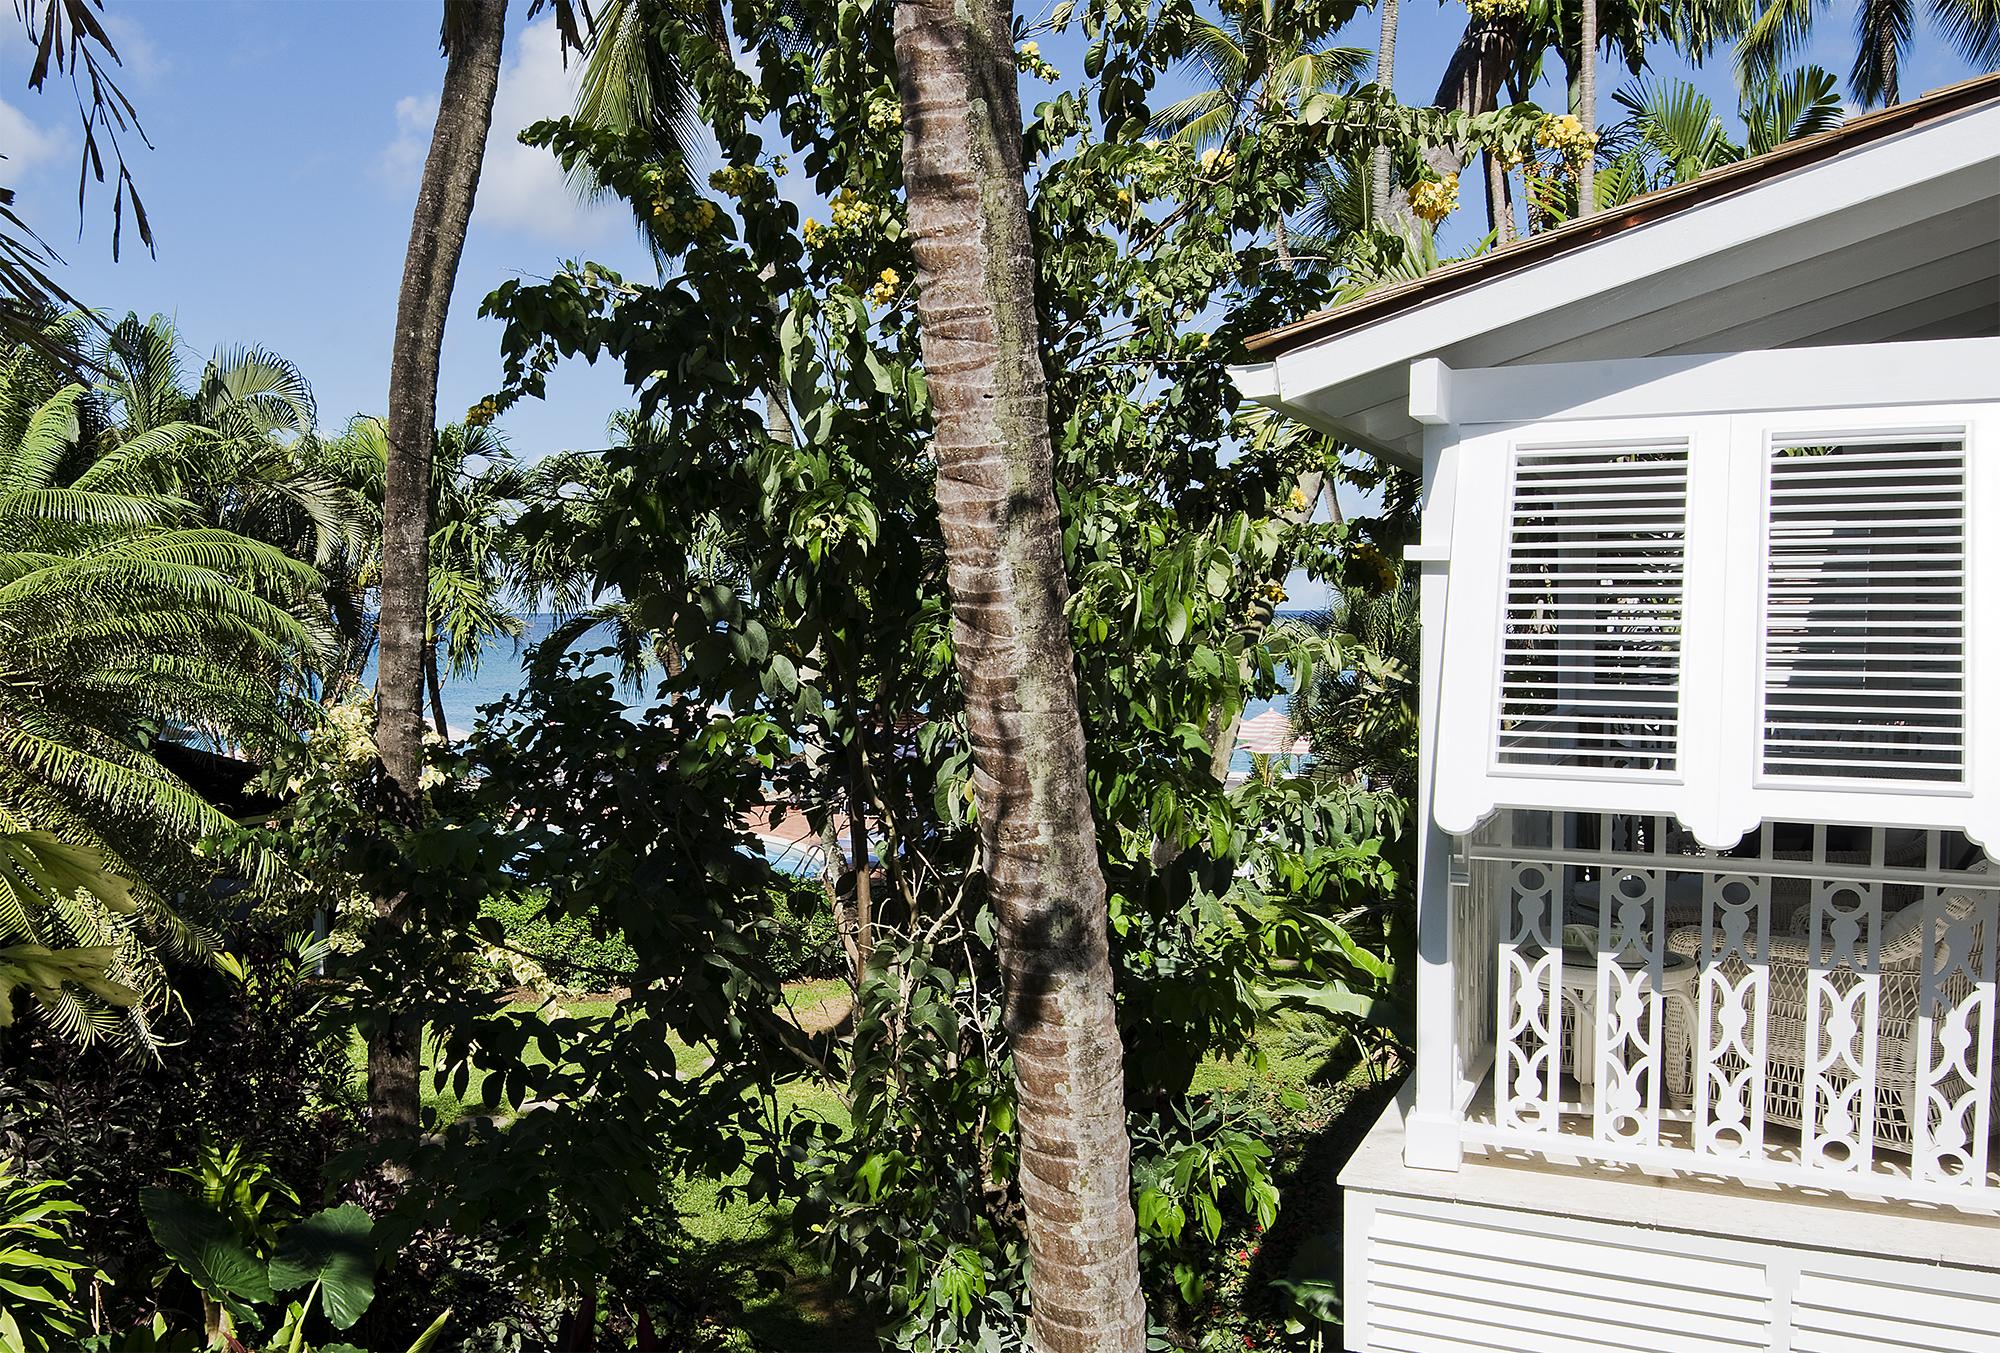 Cobblers-Cove-Gardens-(2).jpg